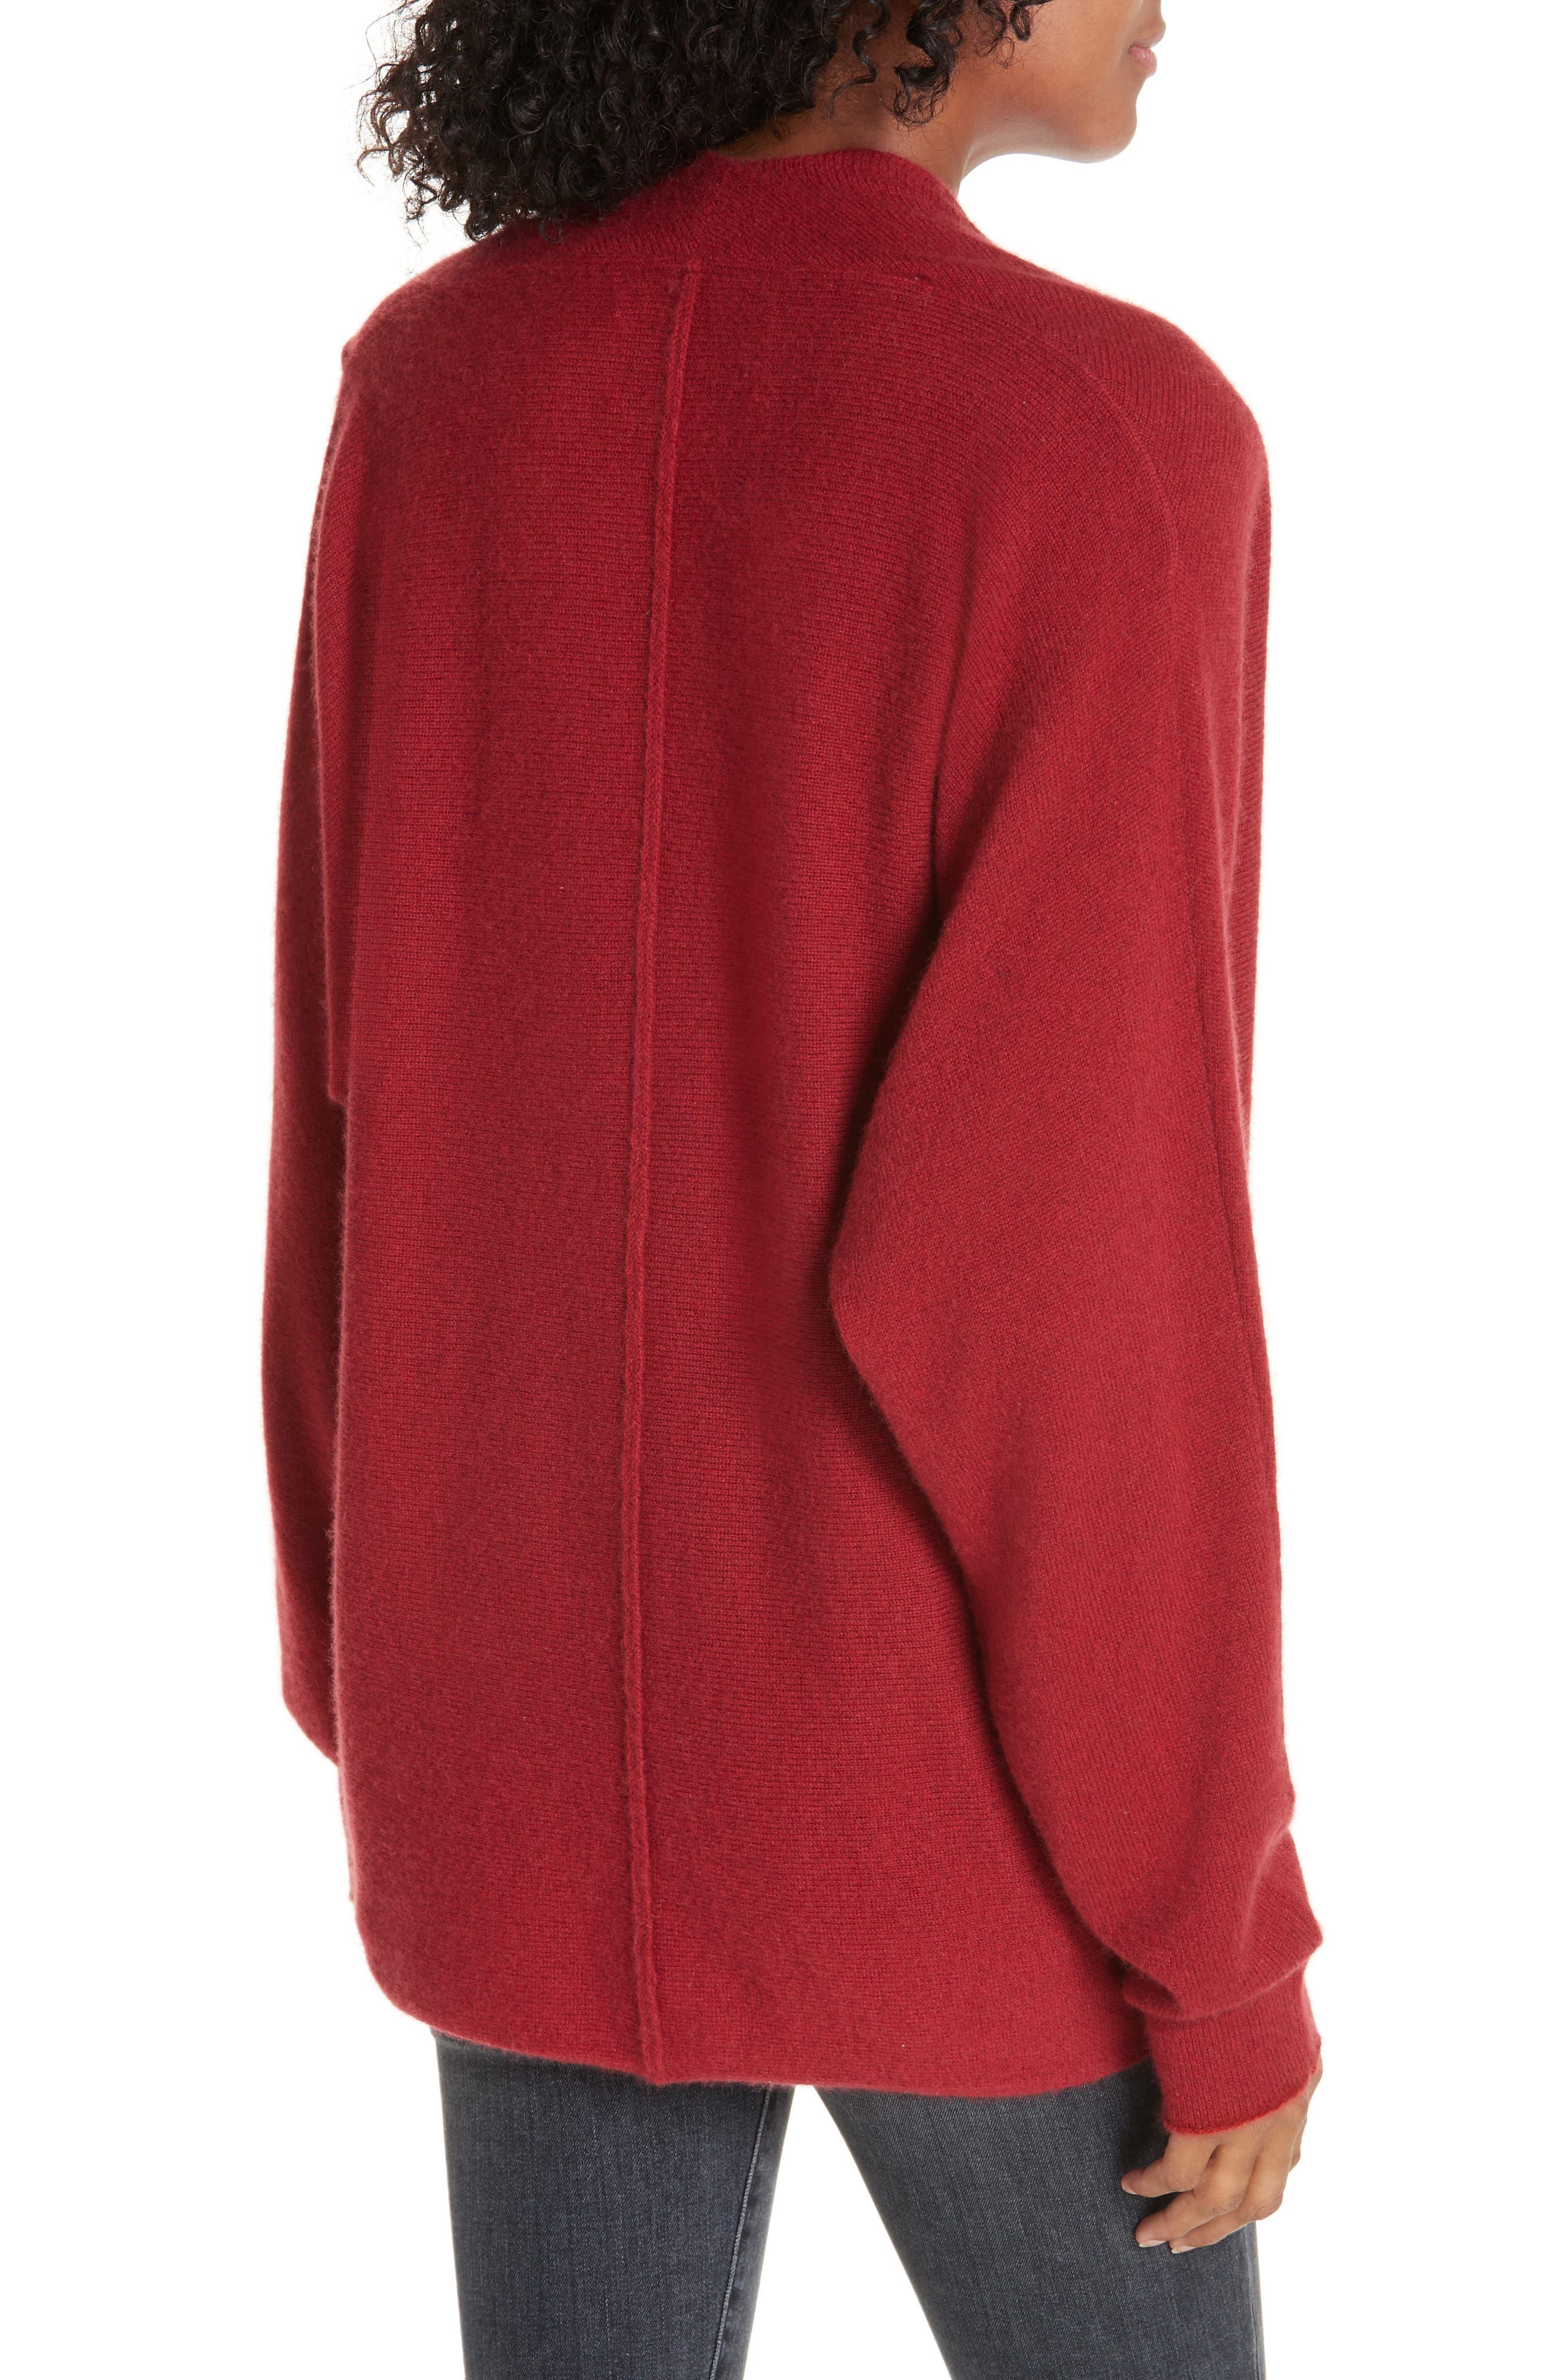 BROCHU WALKER,                             Clea Cashmere Wrap Sweater,                             Alternate thumbnail 2, color,                             TANGIER